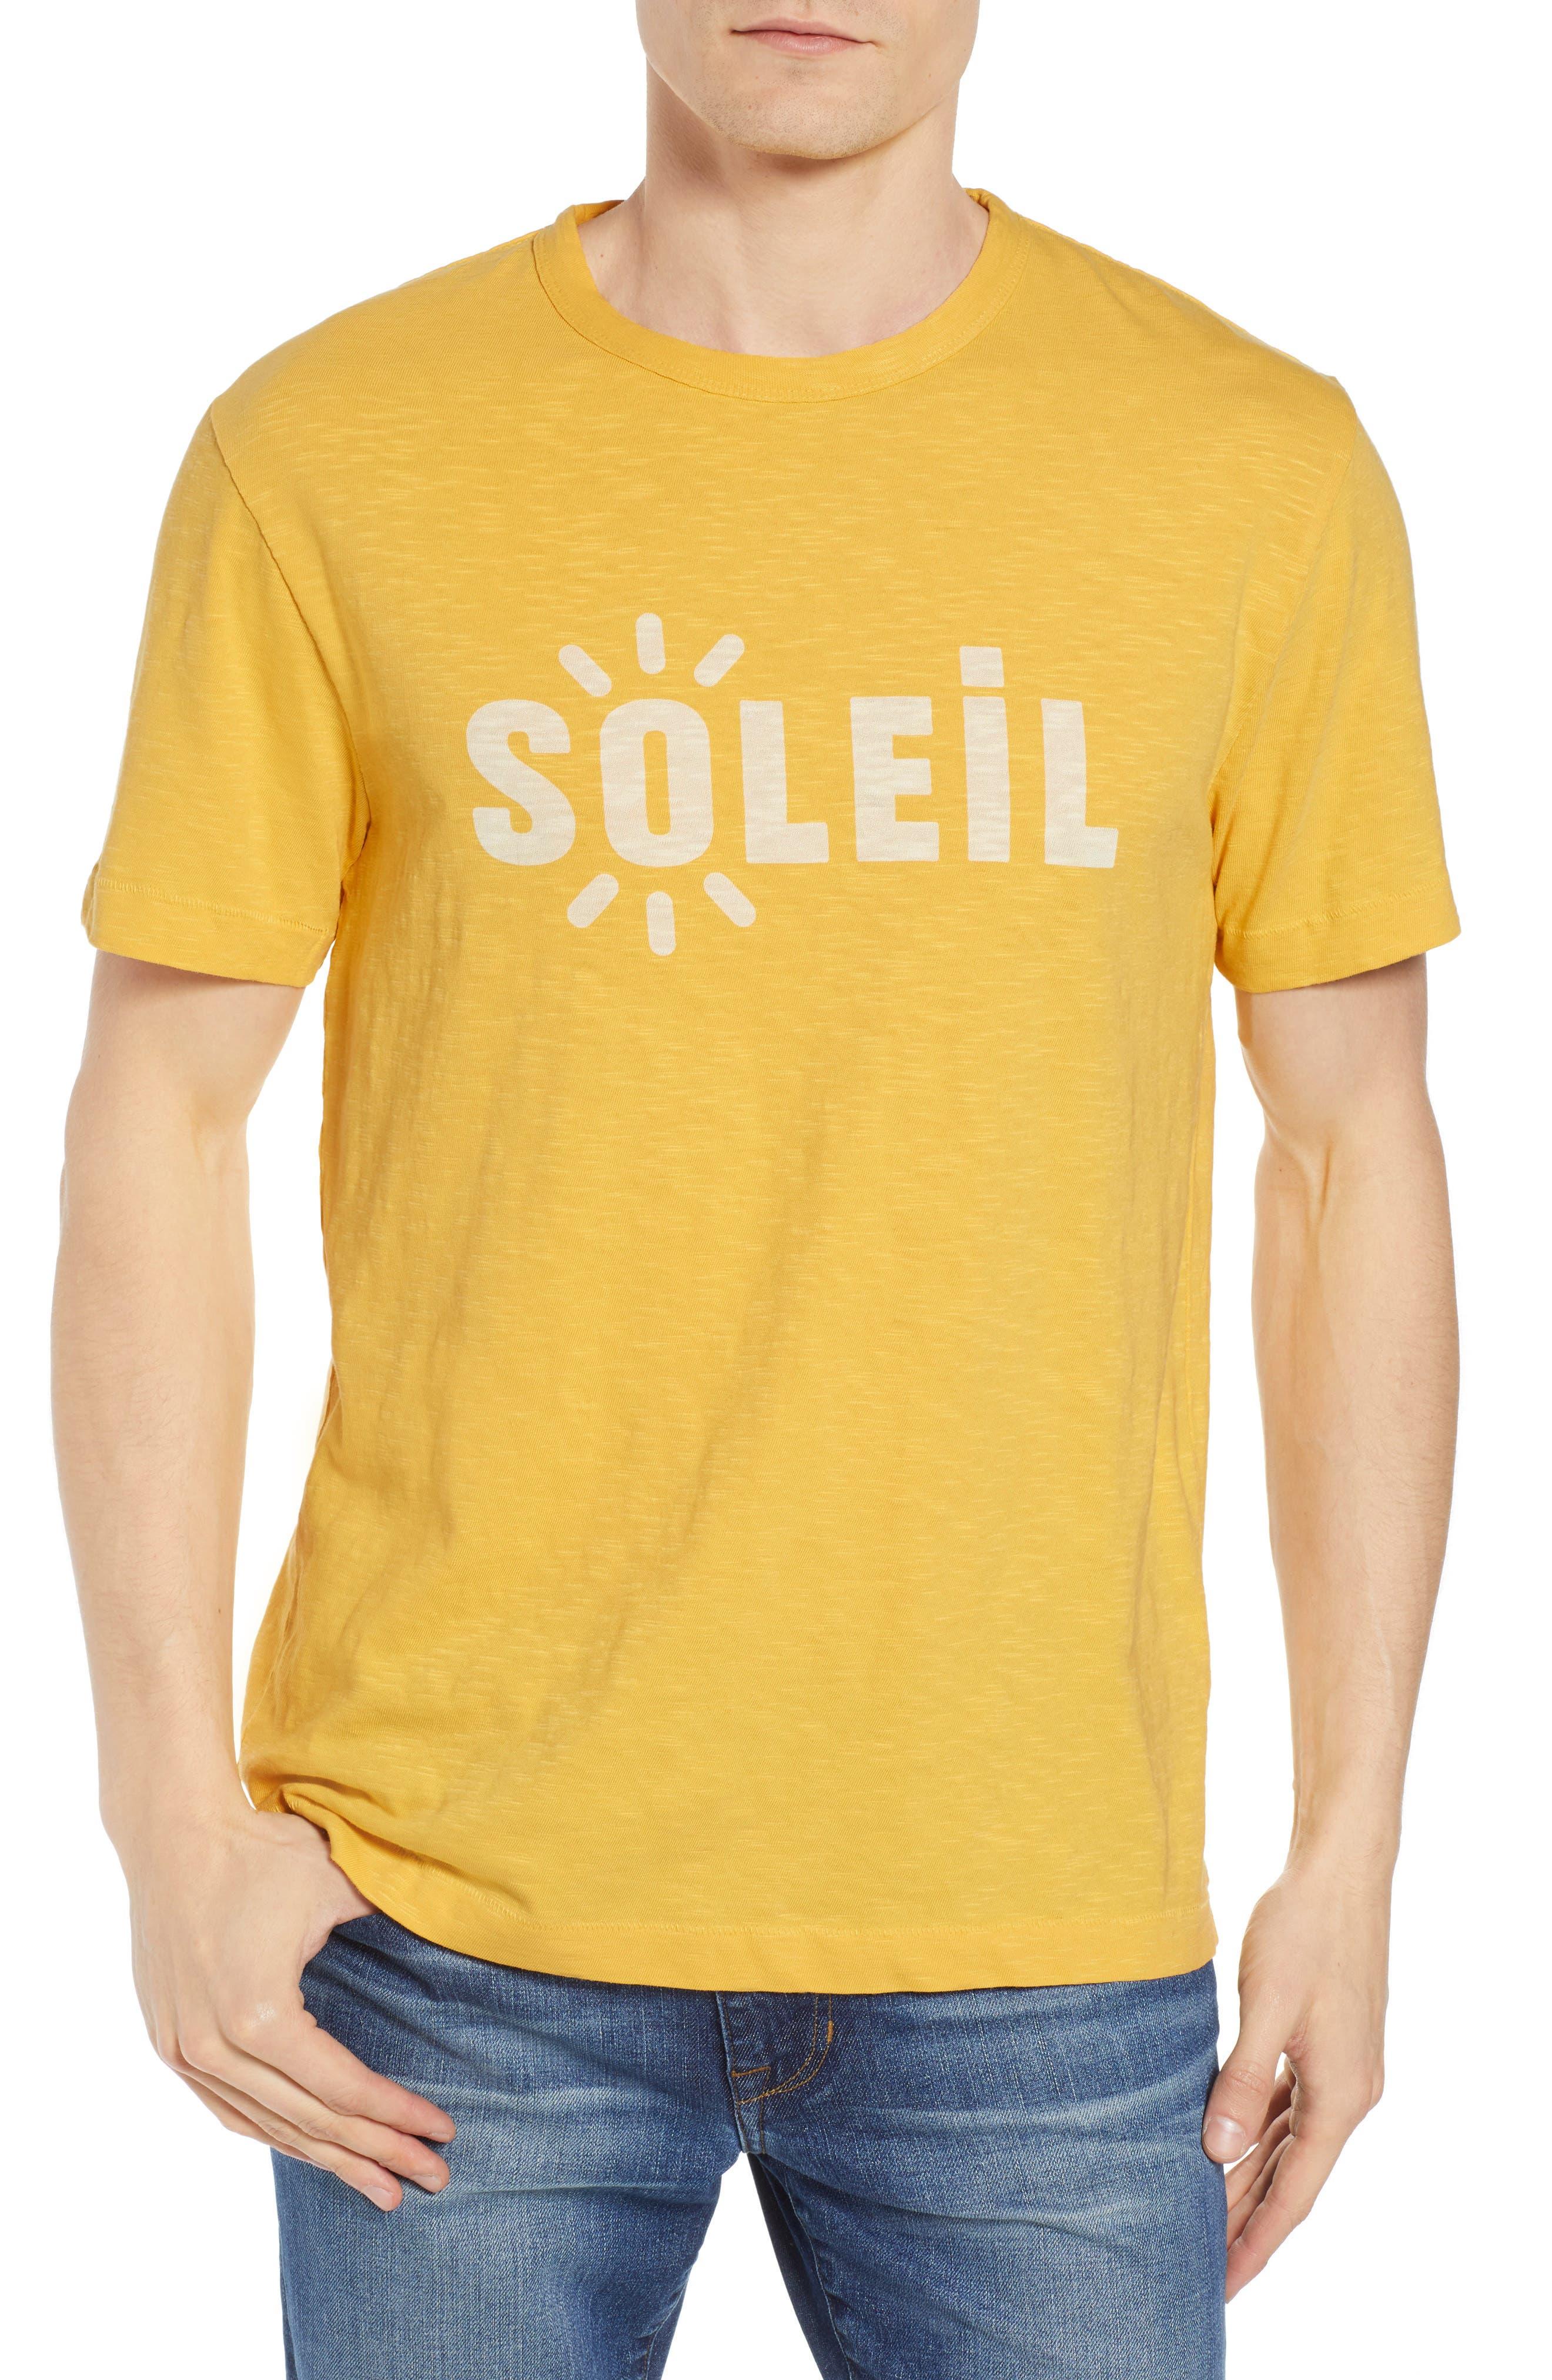 Soleil T-Shirt,                         Main,                         color, Banana